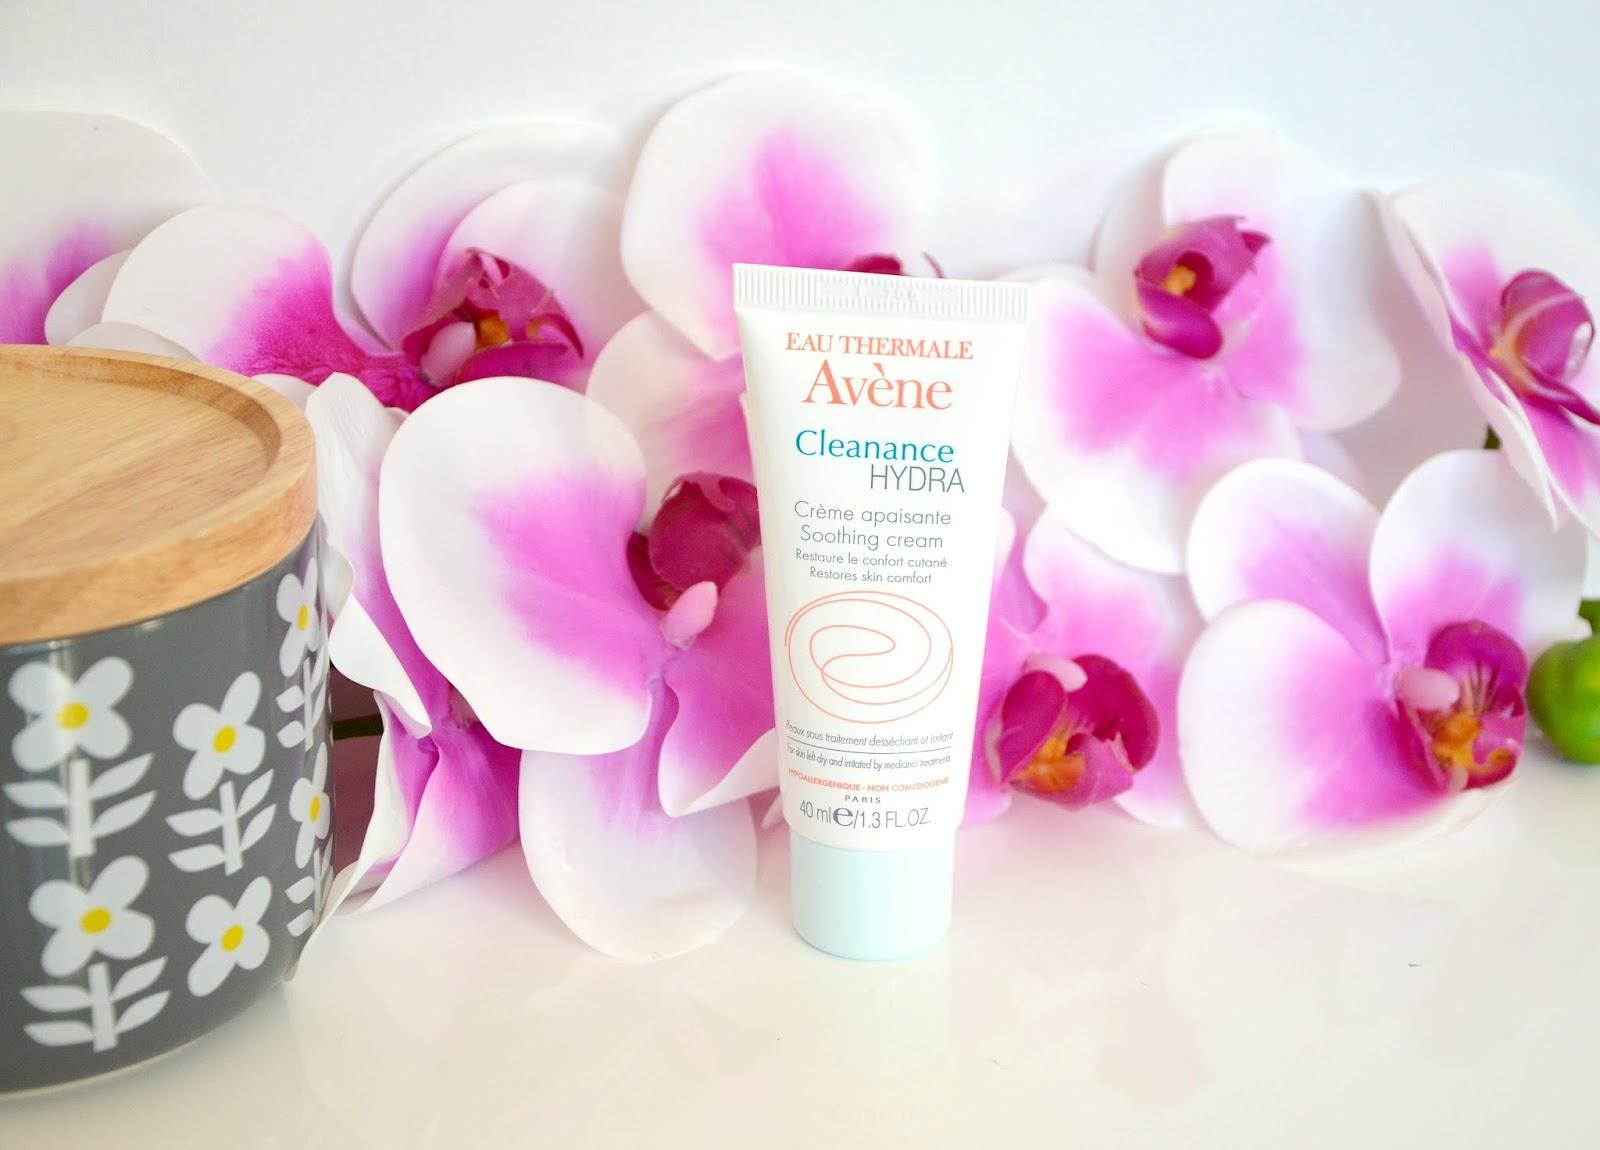 Crème apaisante Cleanance hydra Avène